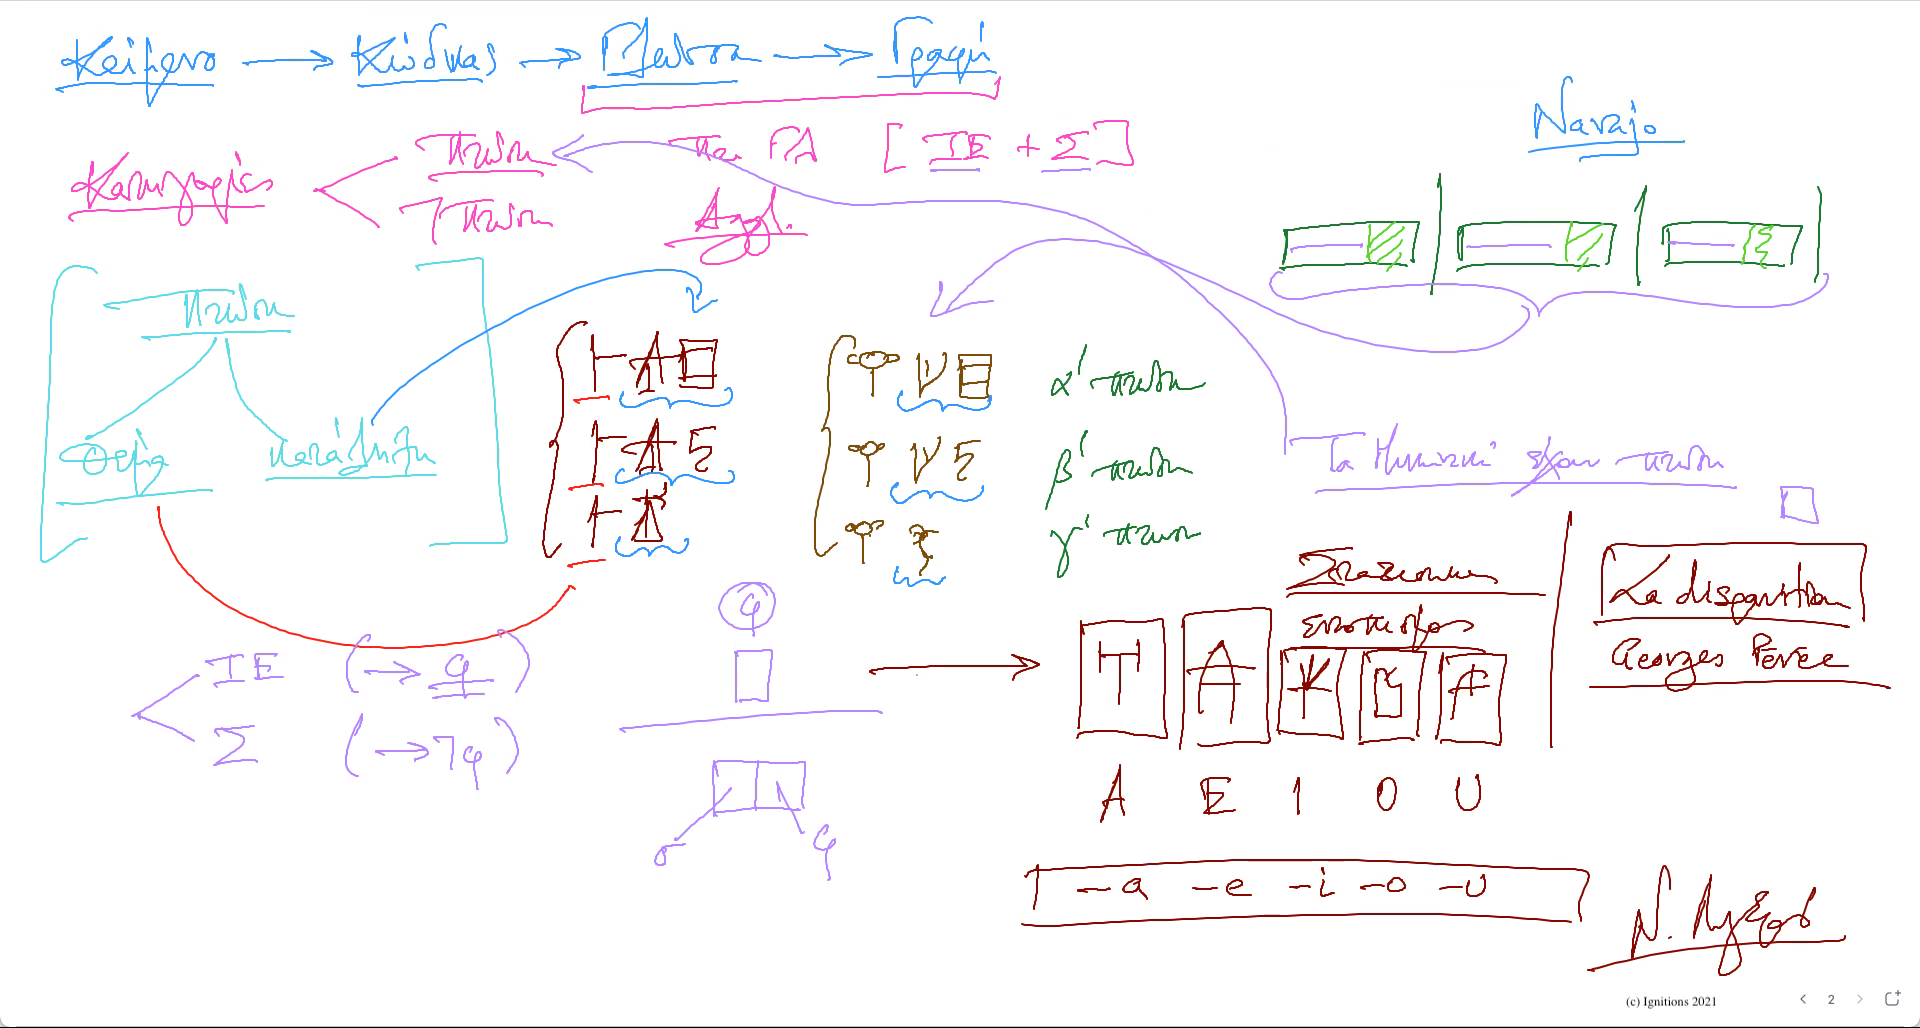 58527 - e-Μάθημα IΙ: Μυκηναϊκά και αποκρυπτογράφηση. (Dessin)